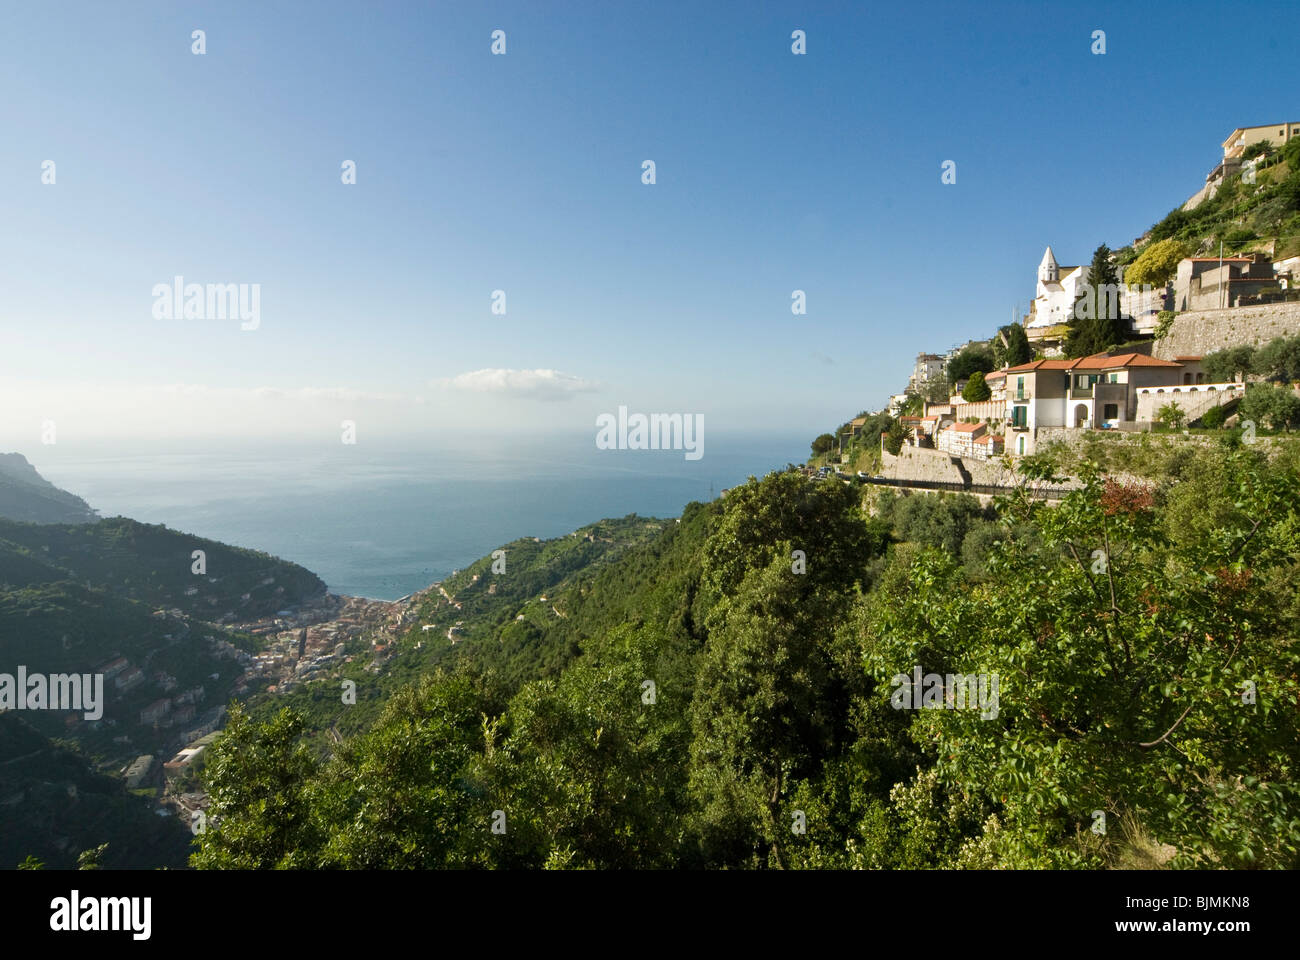 Italien, Kampanien, Amalfiküste, | Italy, Campania, Amalfi Coast - Stock Image